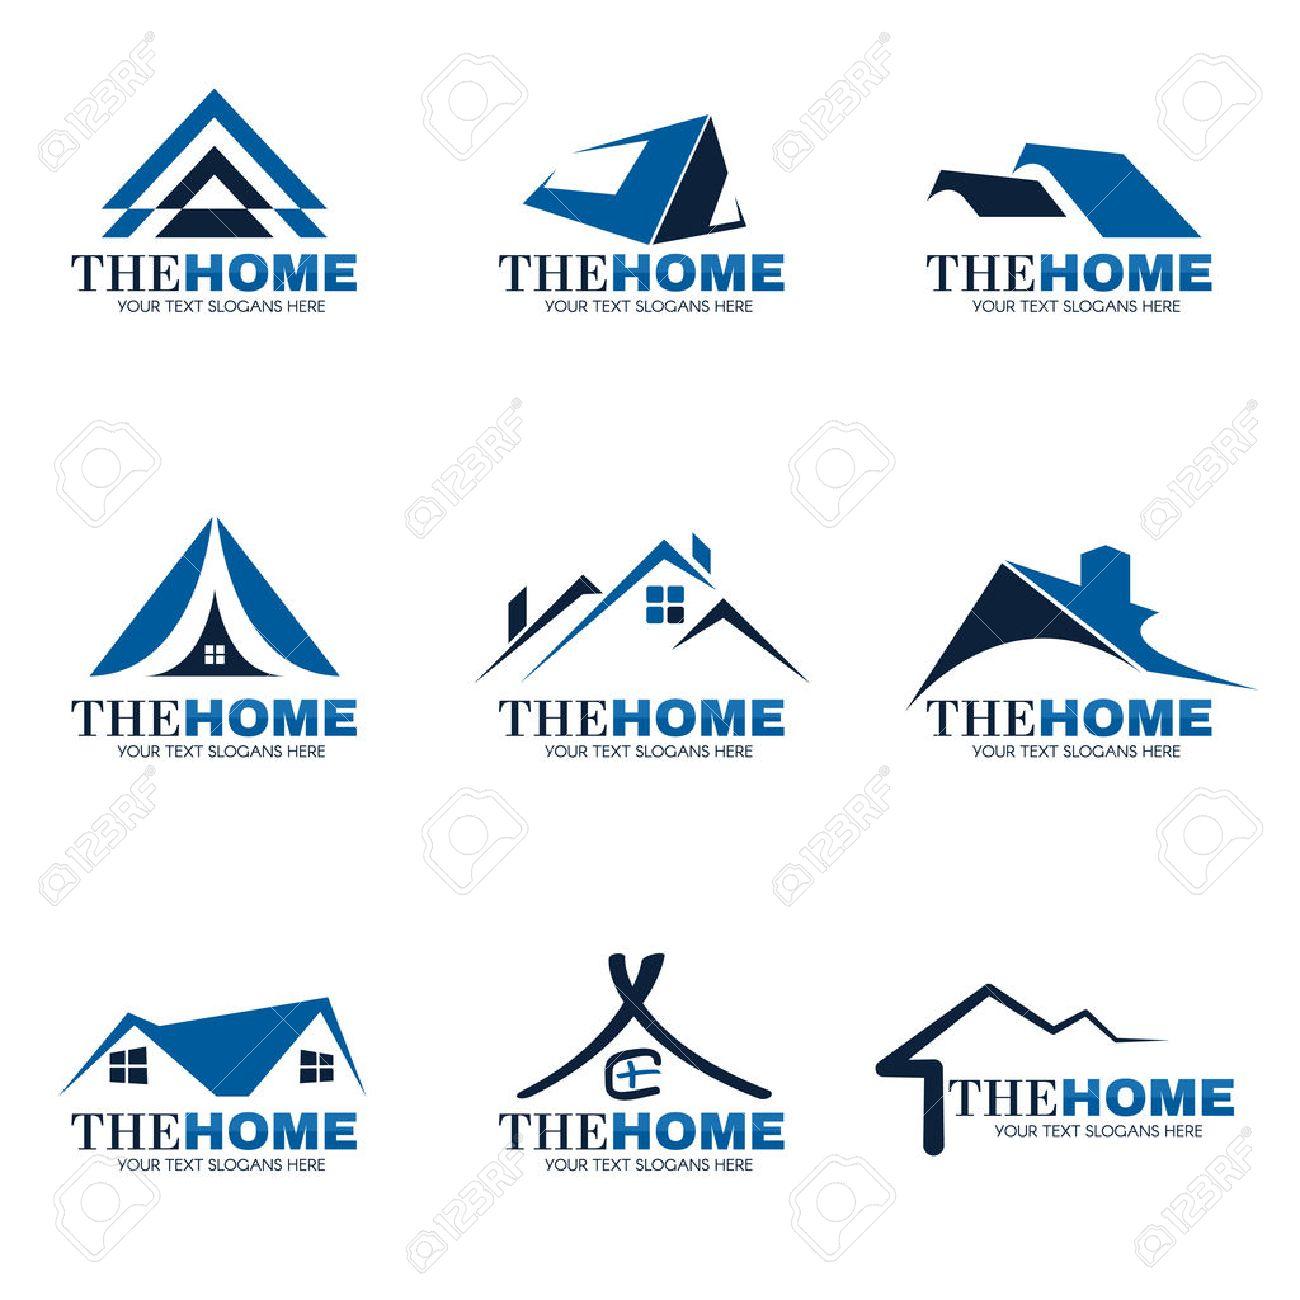 Home Logo blue and gray home logo set vector design royalty free cliparts